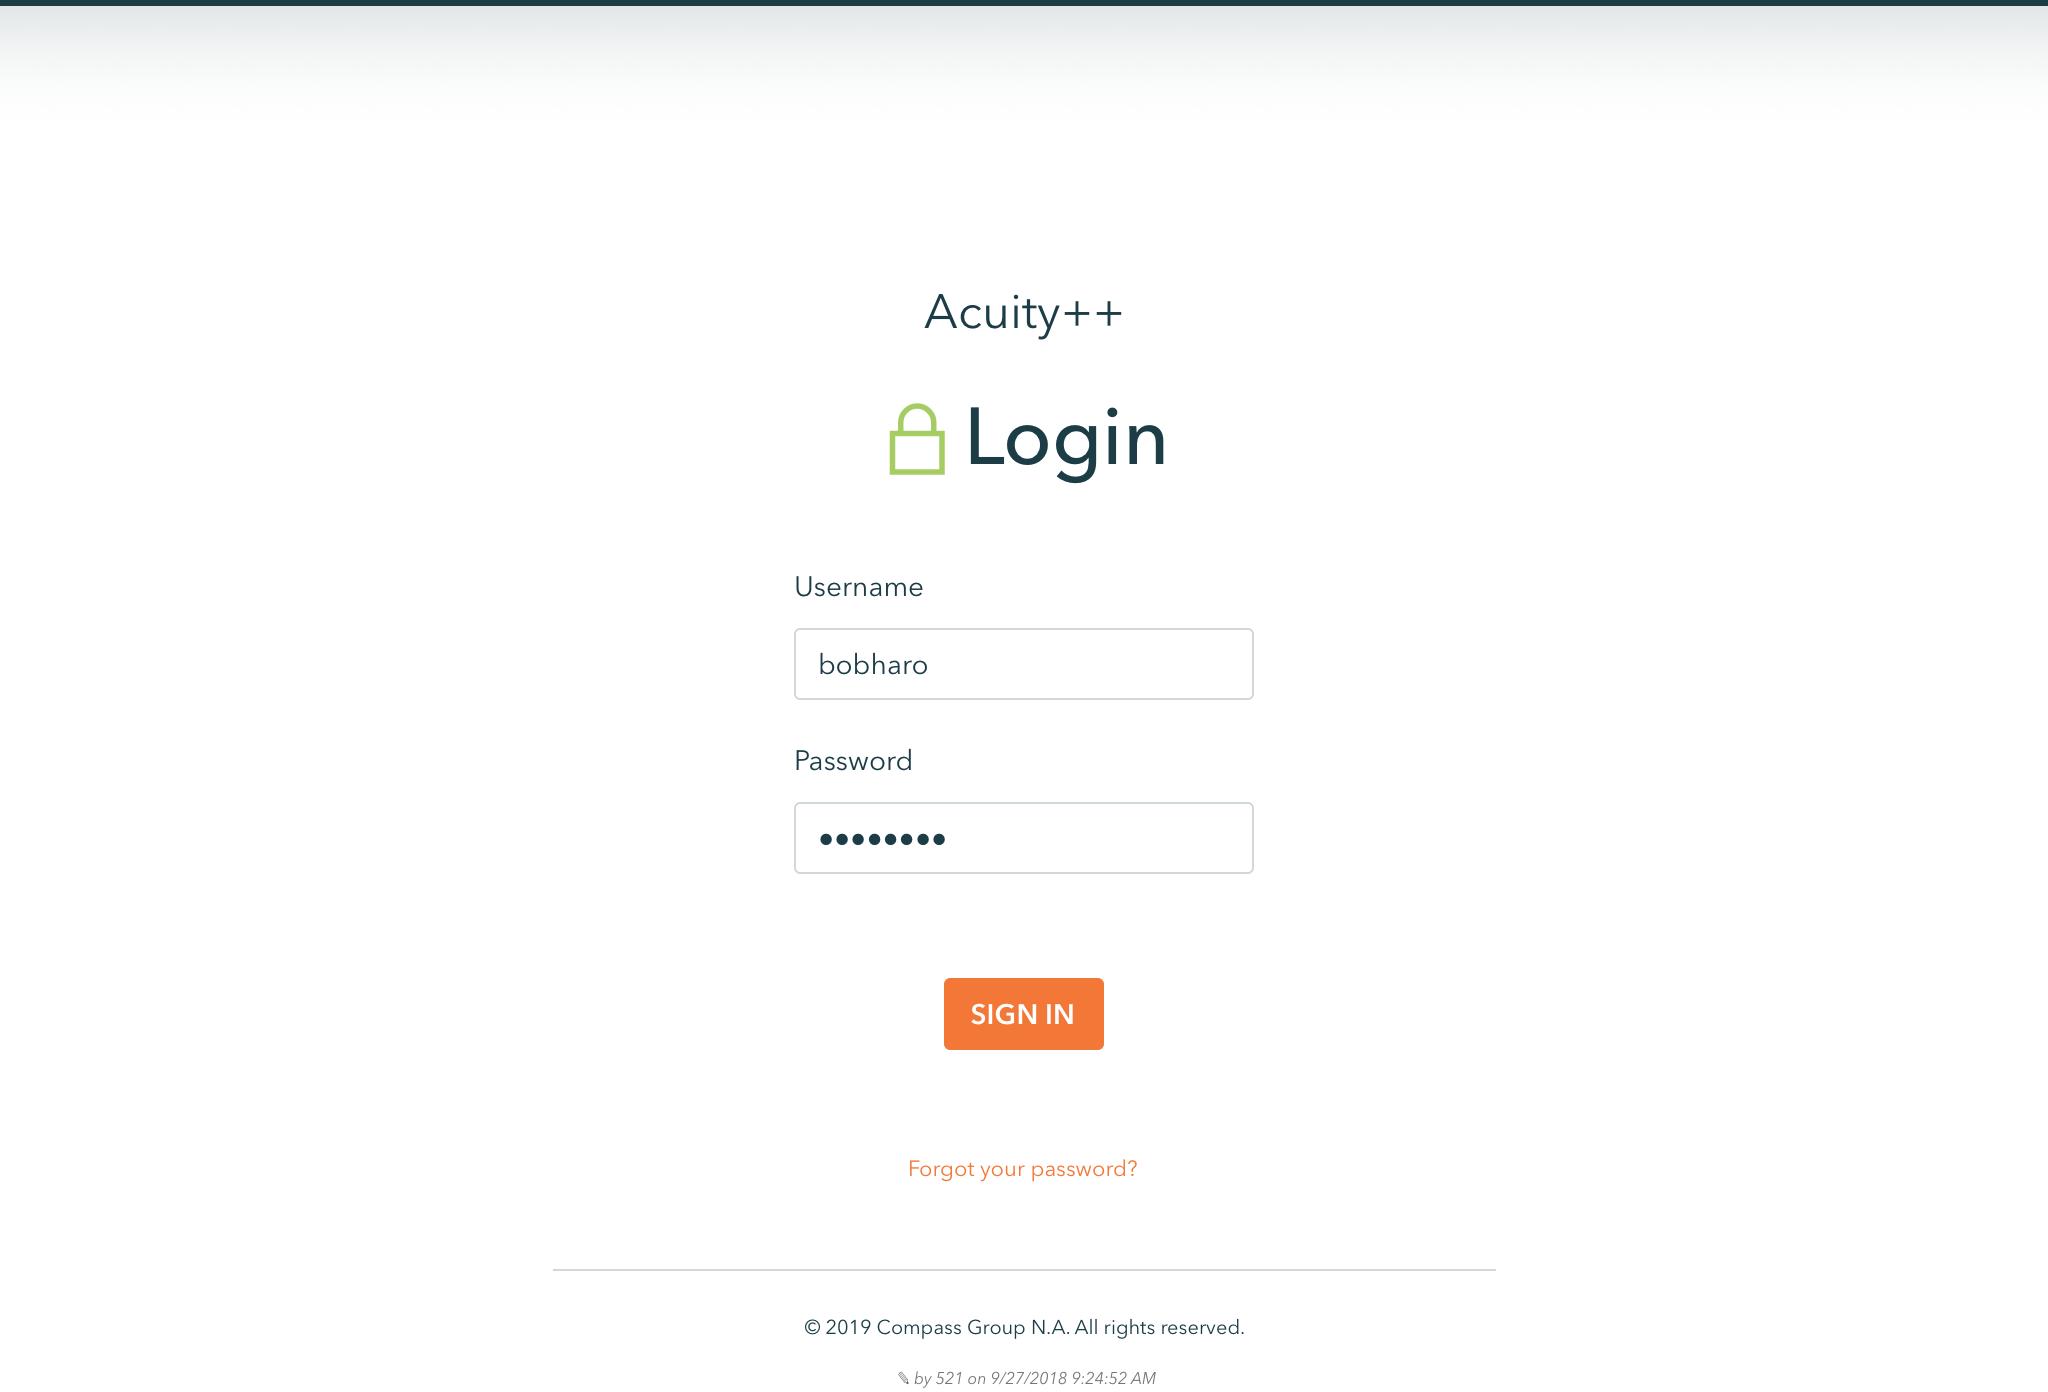 Login - Desktop